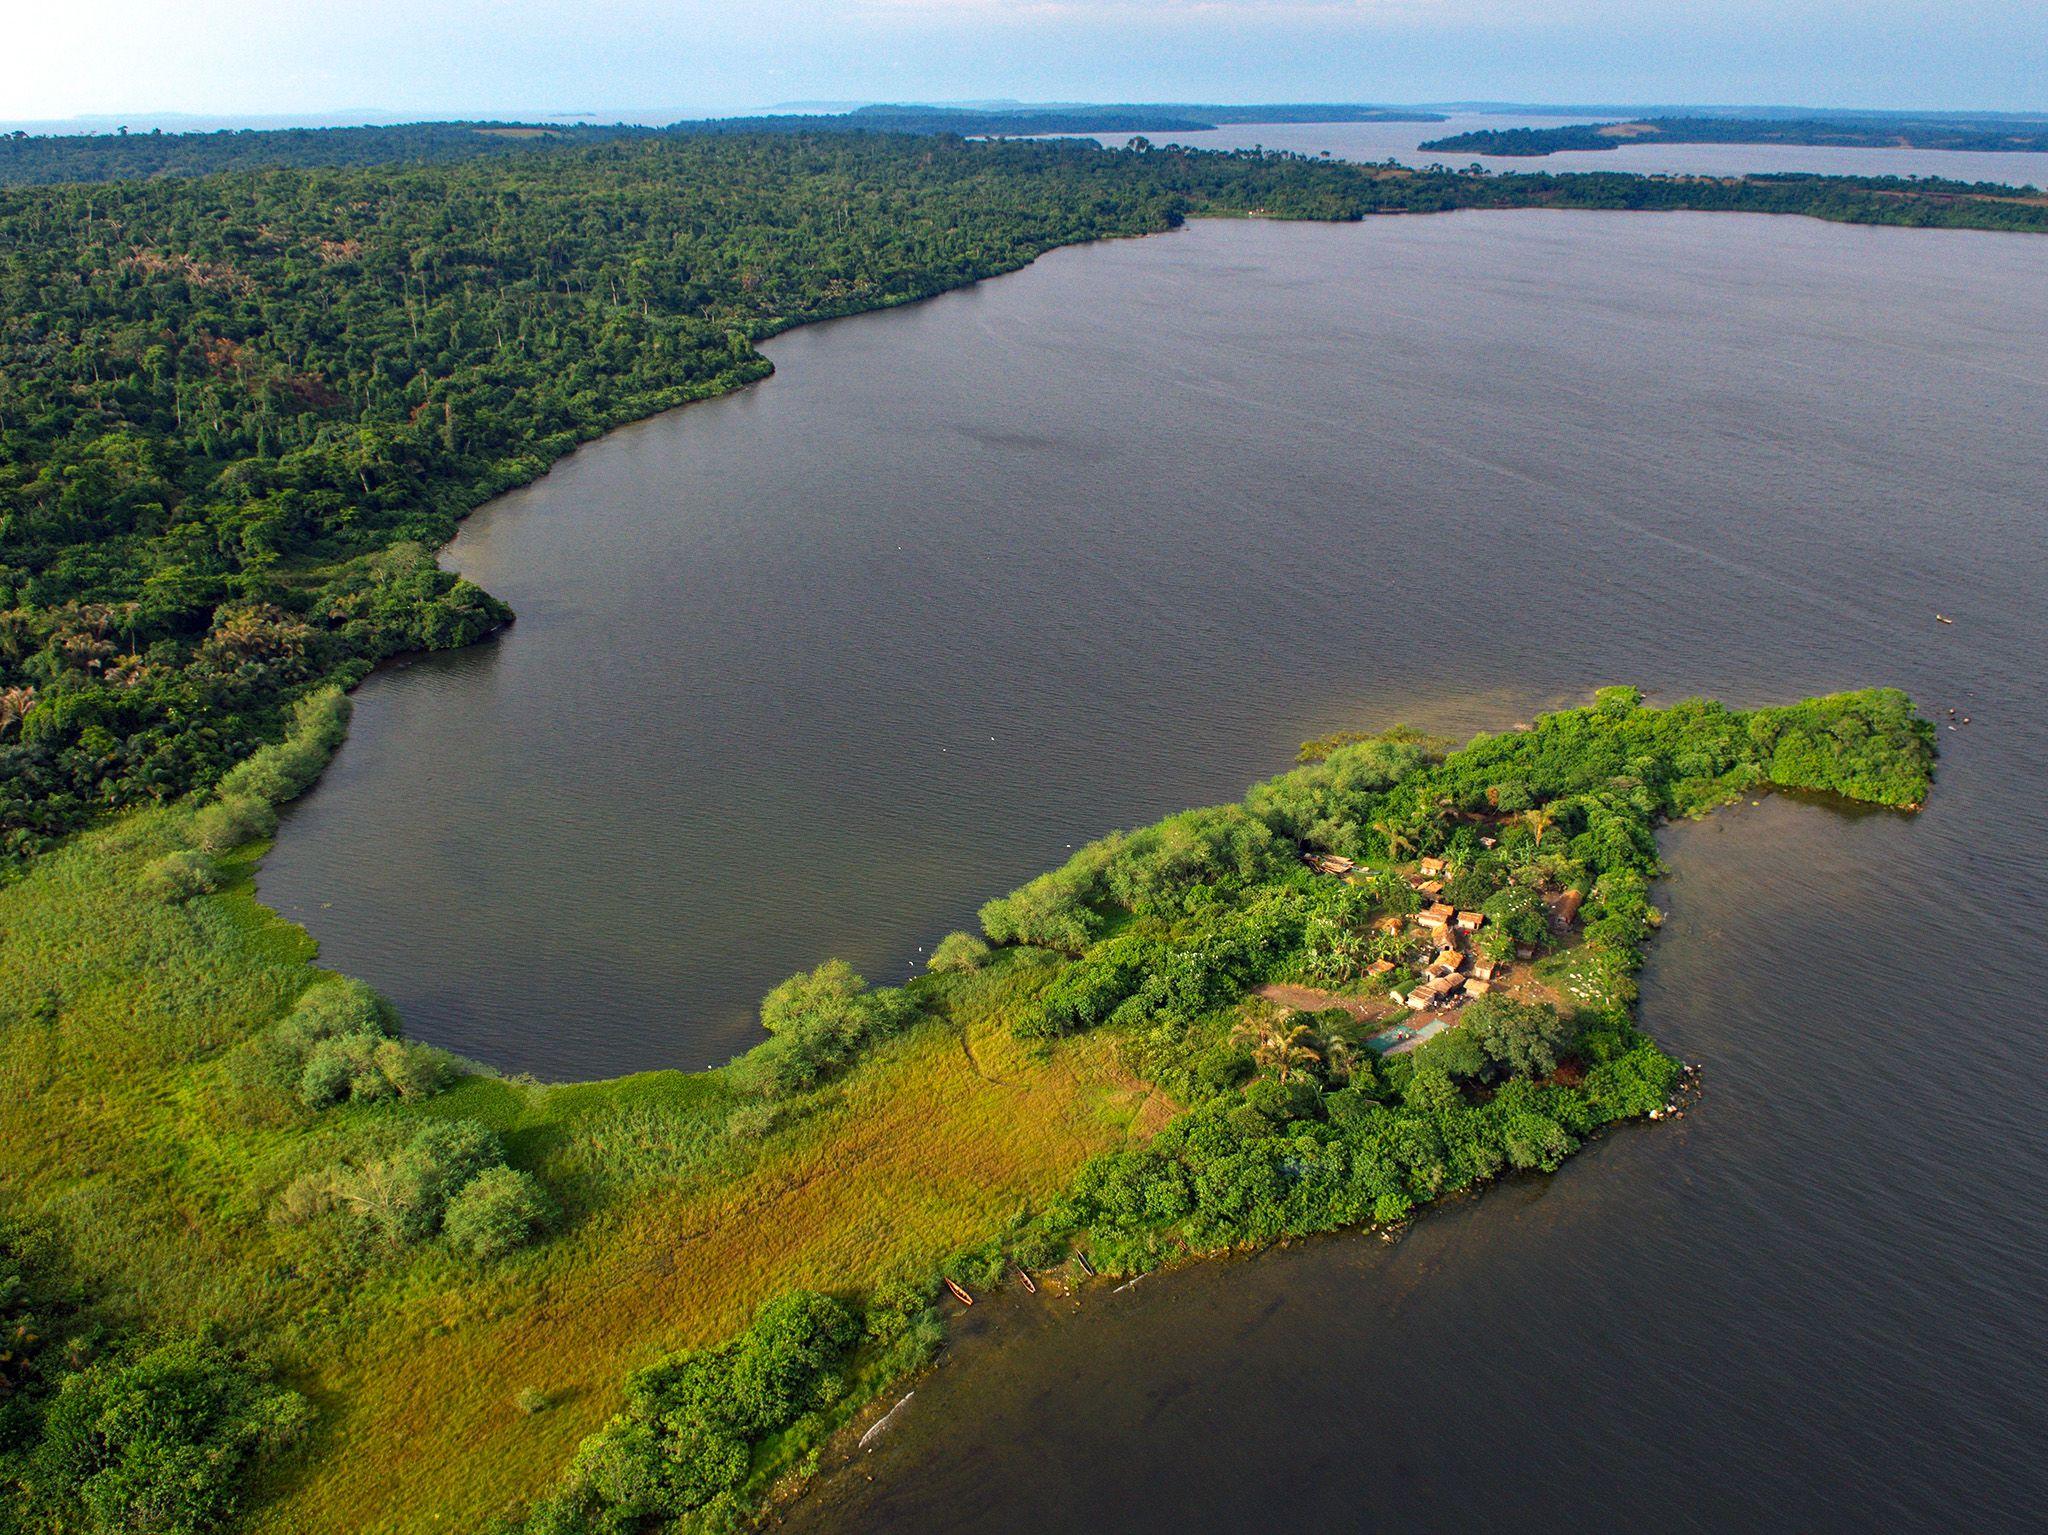 Uganda:  Island village, Lake Victoria. This image is from Wild Uganda. [Foto del giorno - September 2018]